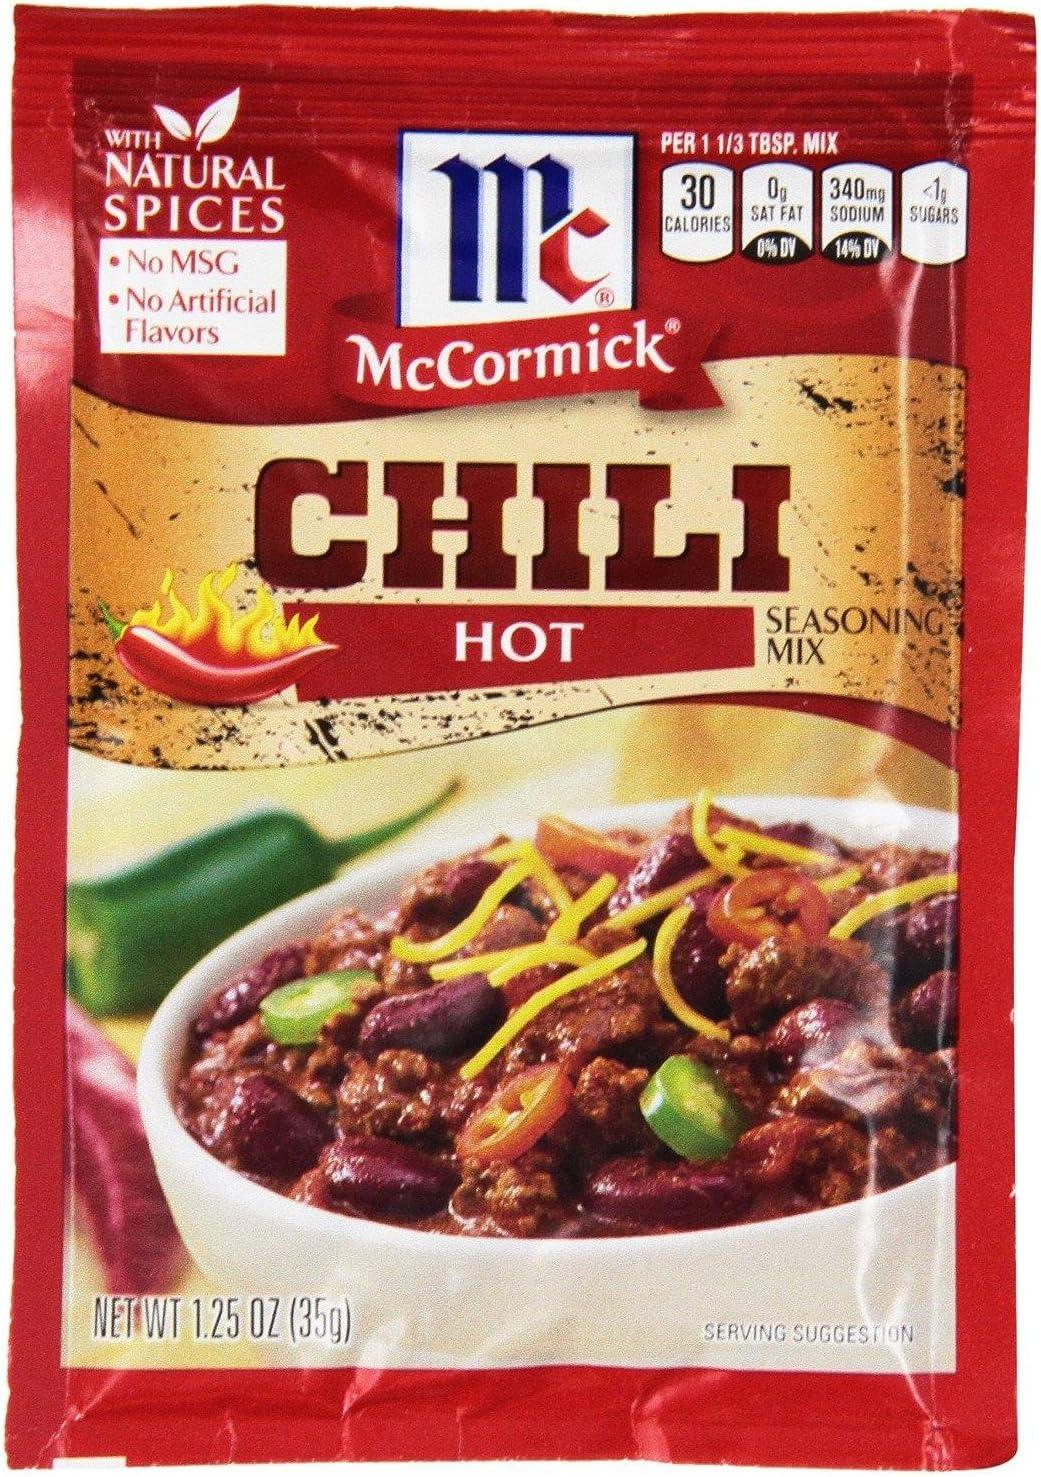 McCormick HOT Chili Seasoning Mix (Pack of 4) 1.25 oz Packets